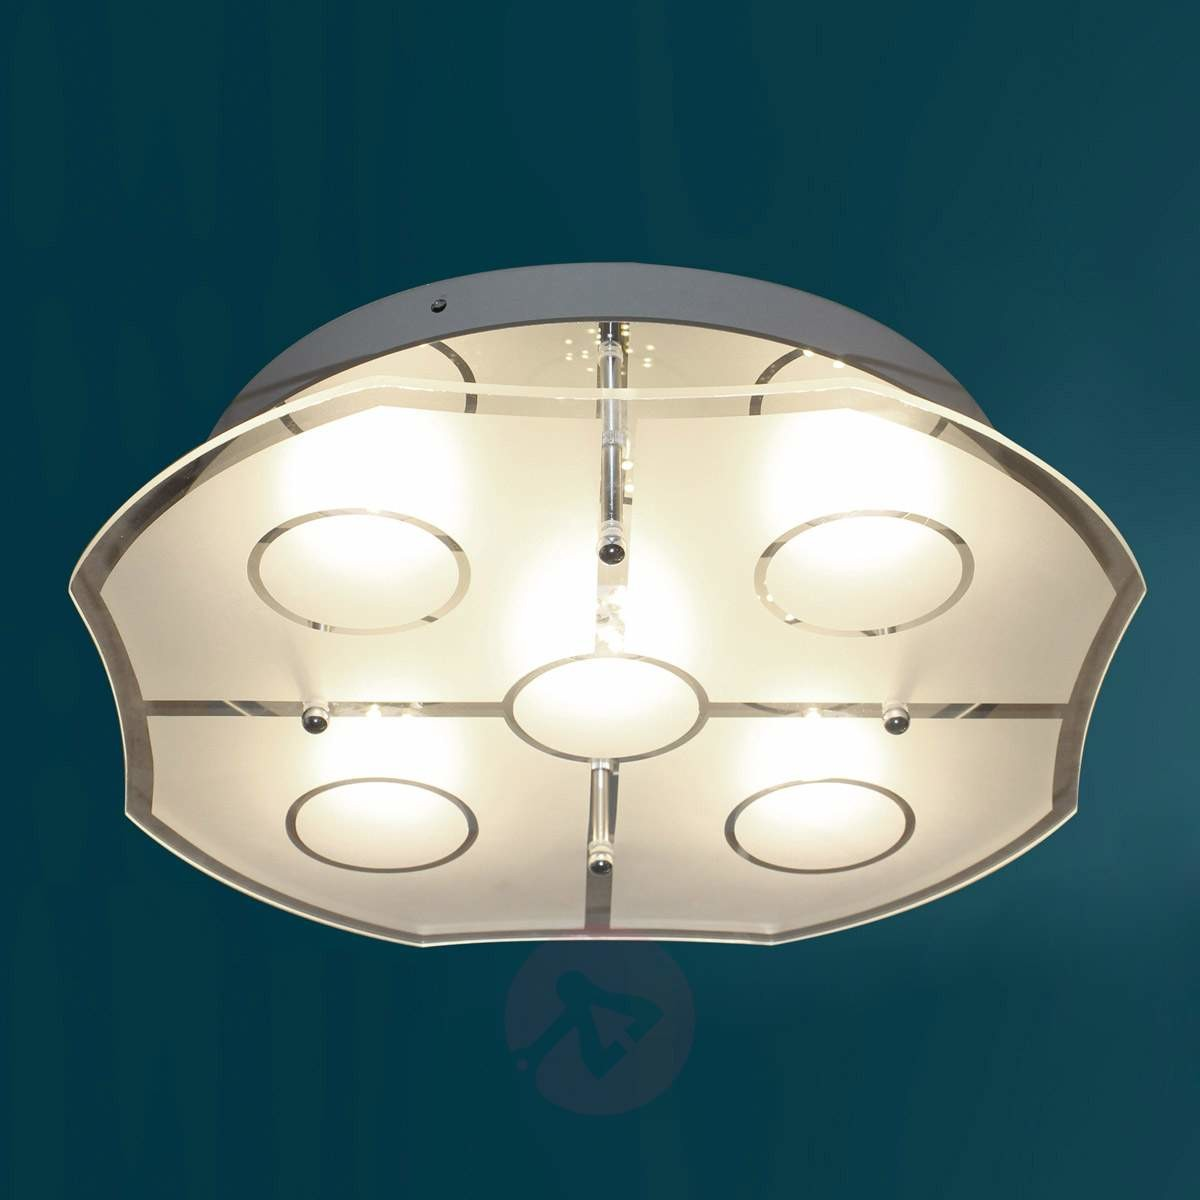 Eco Light ECO Light lampa sufitowa LED Varese, chrom, 1800LM, 30W, 35x 35cm, IP20, w kolorze srebrnym 8708 8708